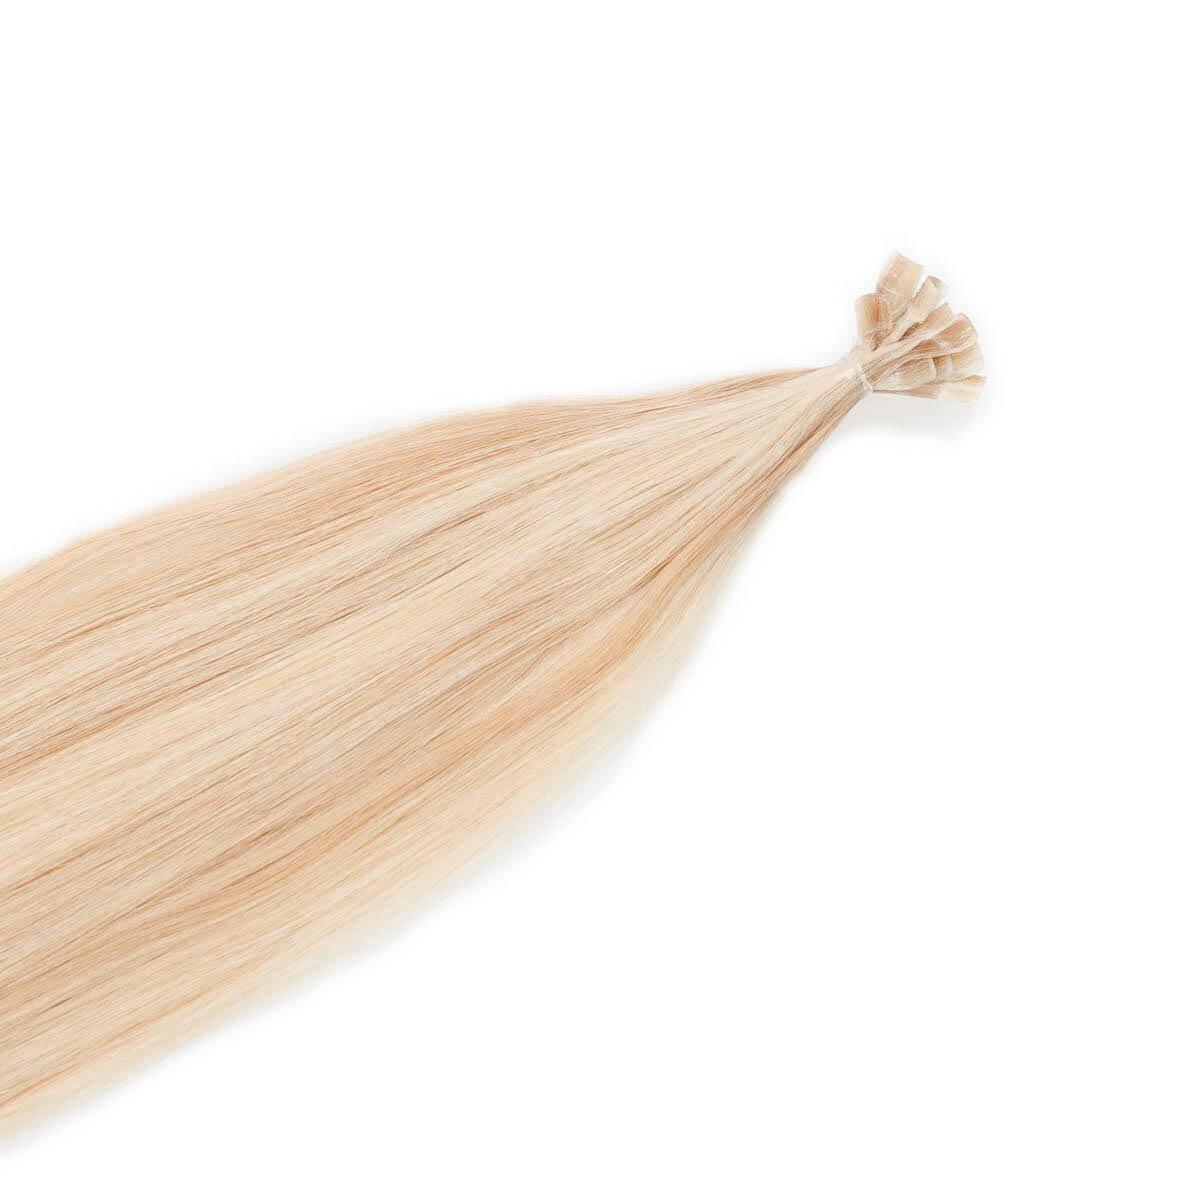 Nail Hair Original M7.5/10.8 Scandinavian Blonde Mix 30 cm